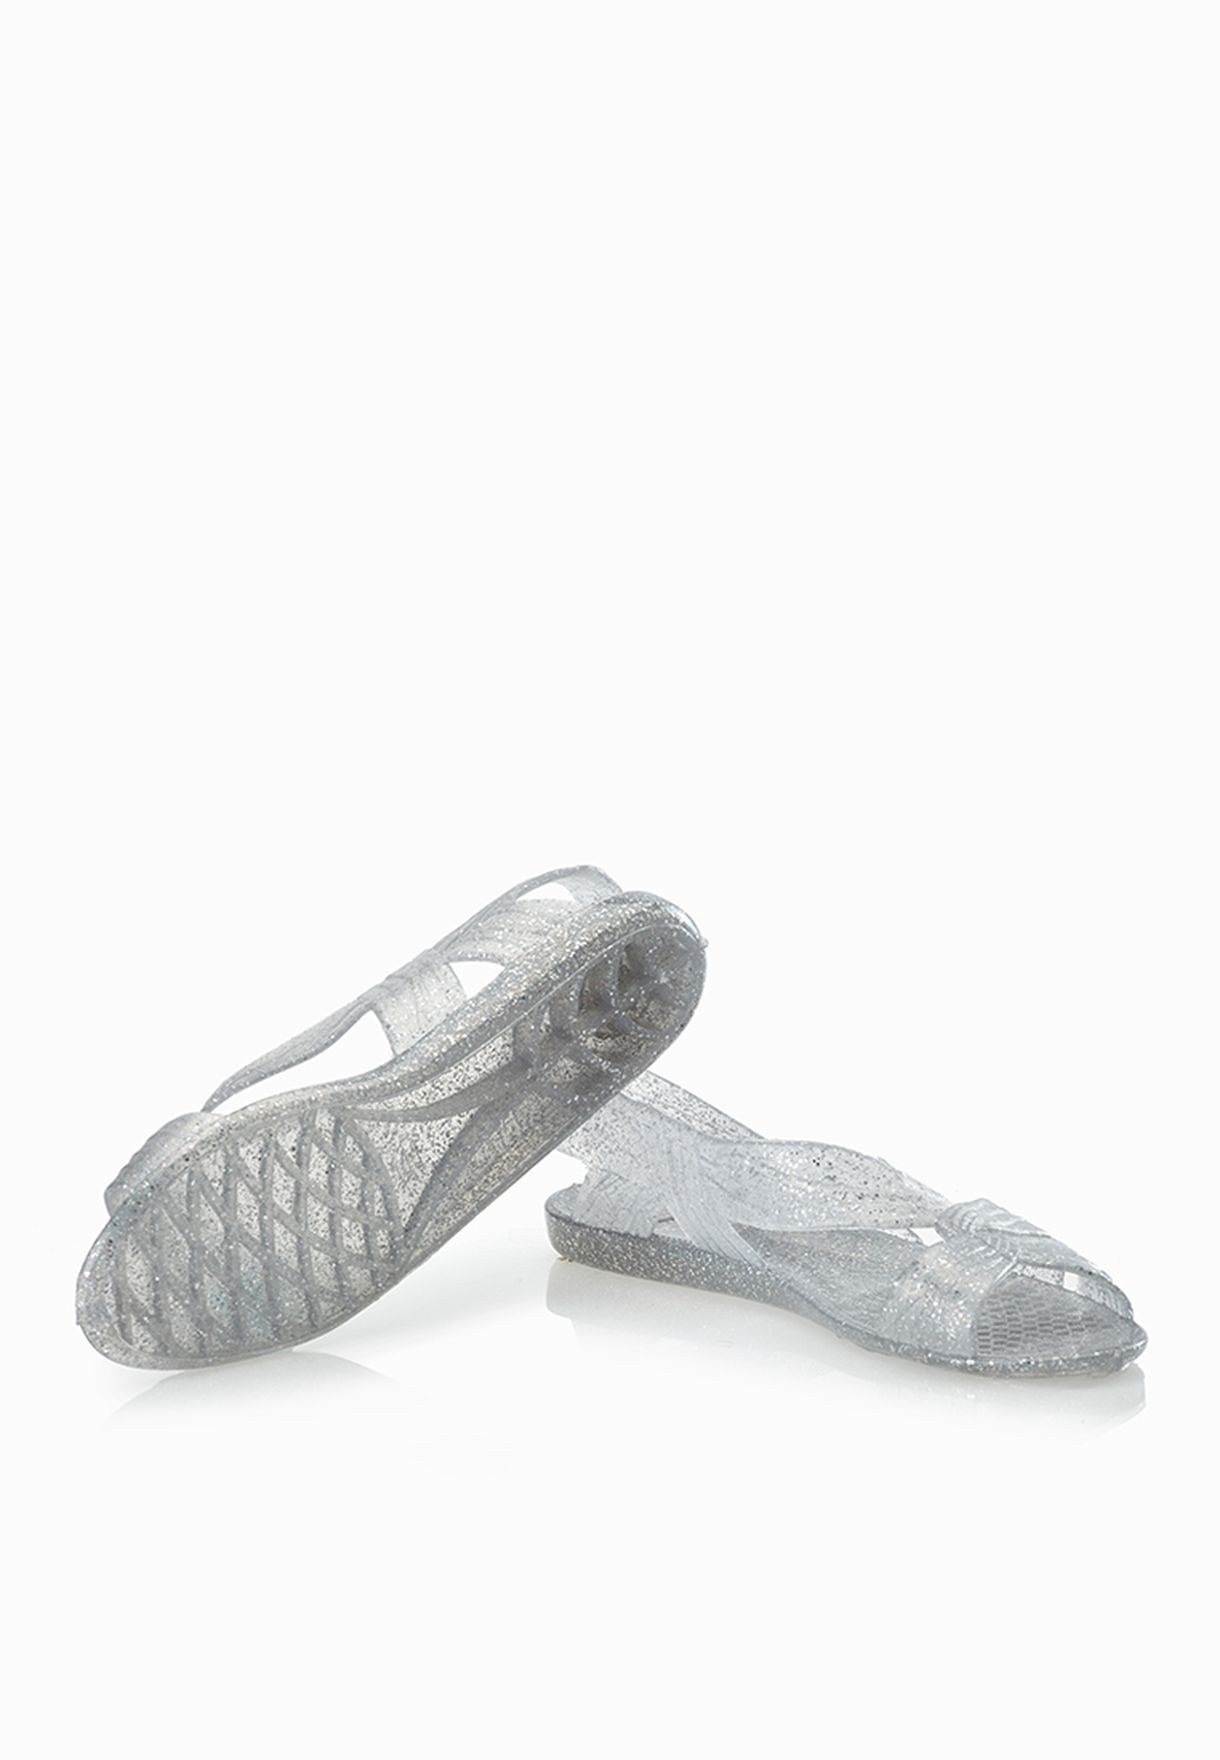 65a603c6f607 Shop Juju neutrals Fergie Stylish Jelly Sandals for Women in Qatar ...